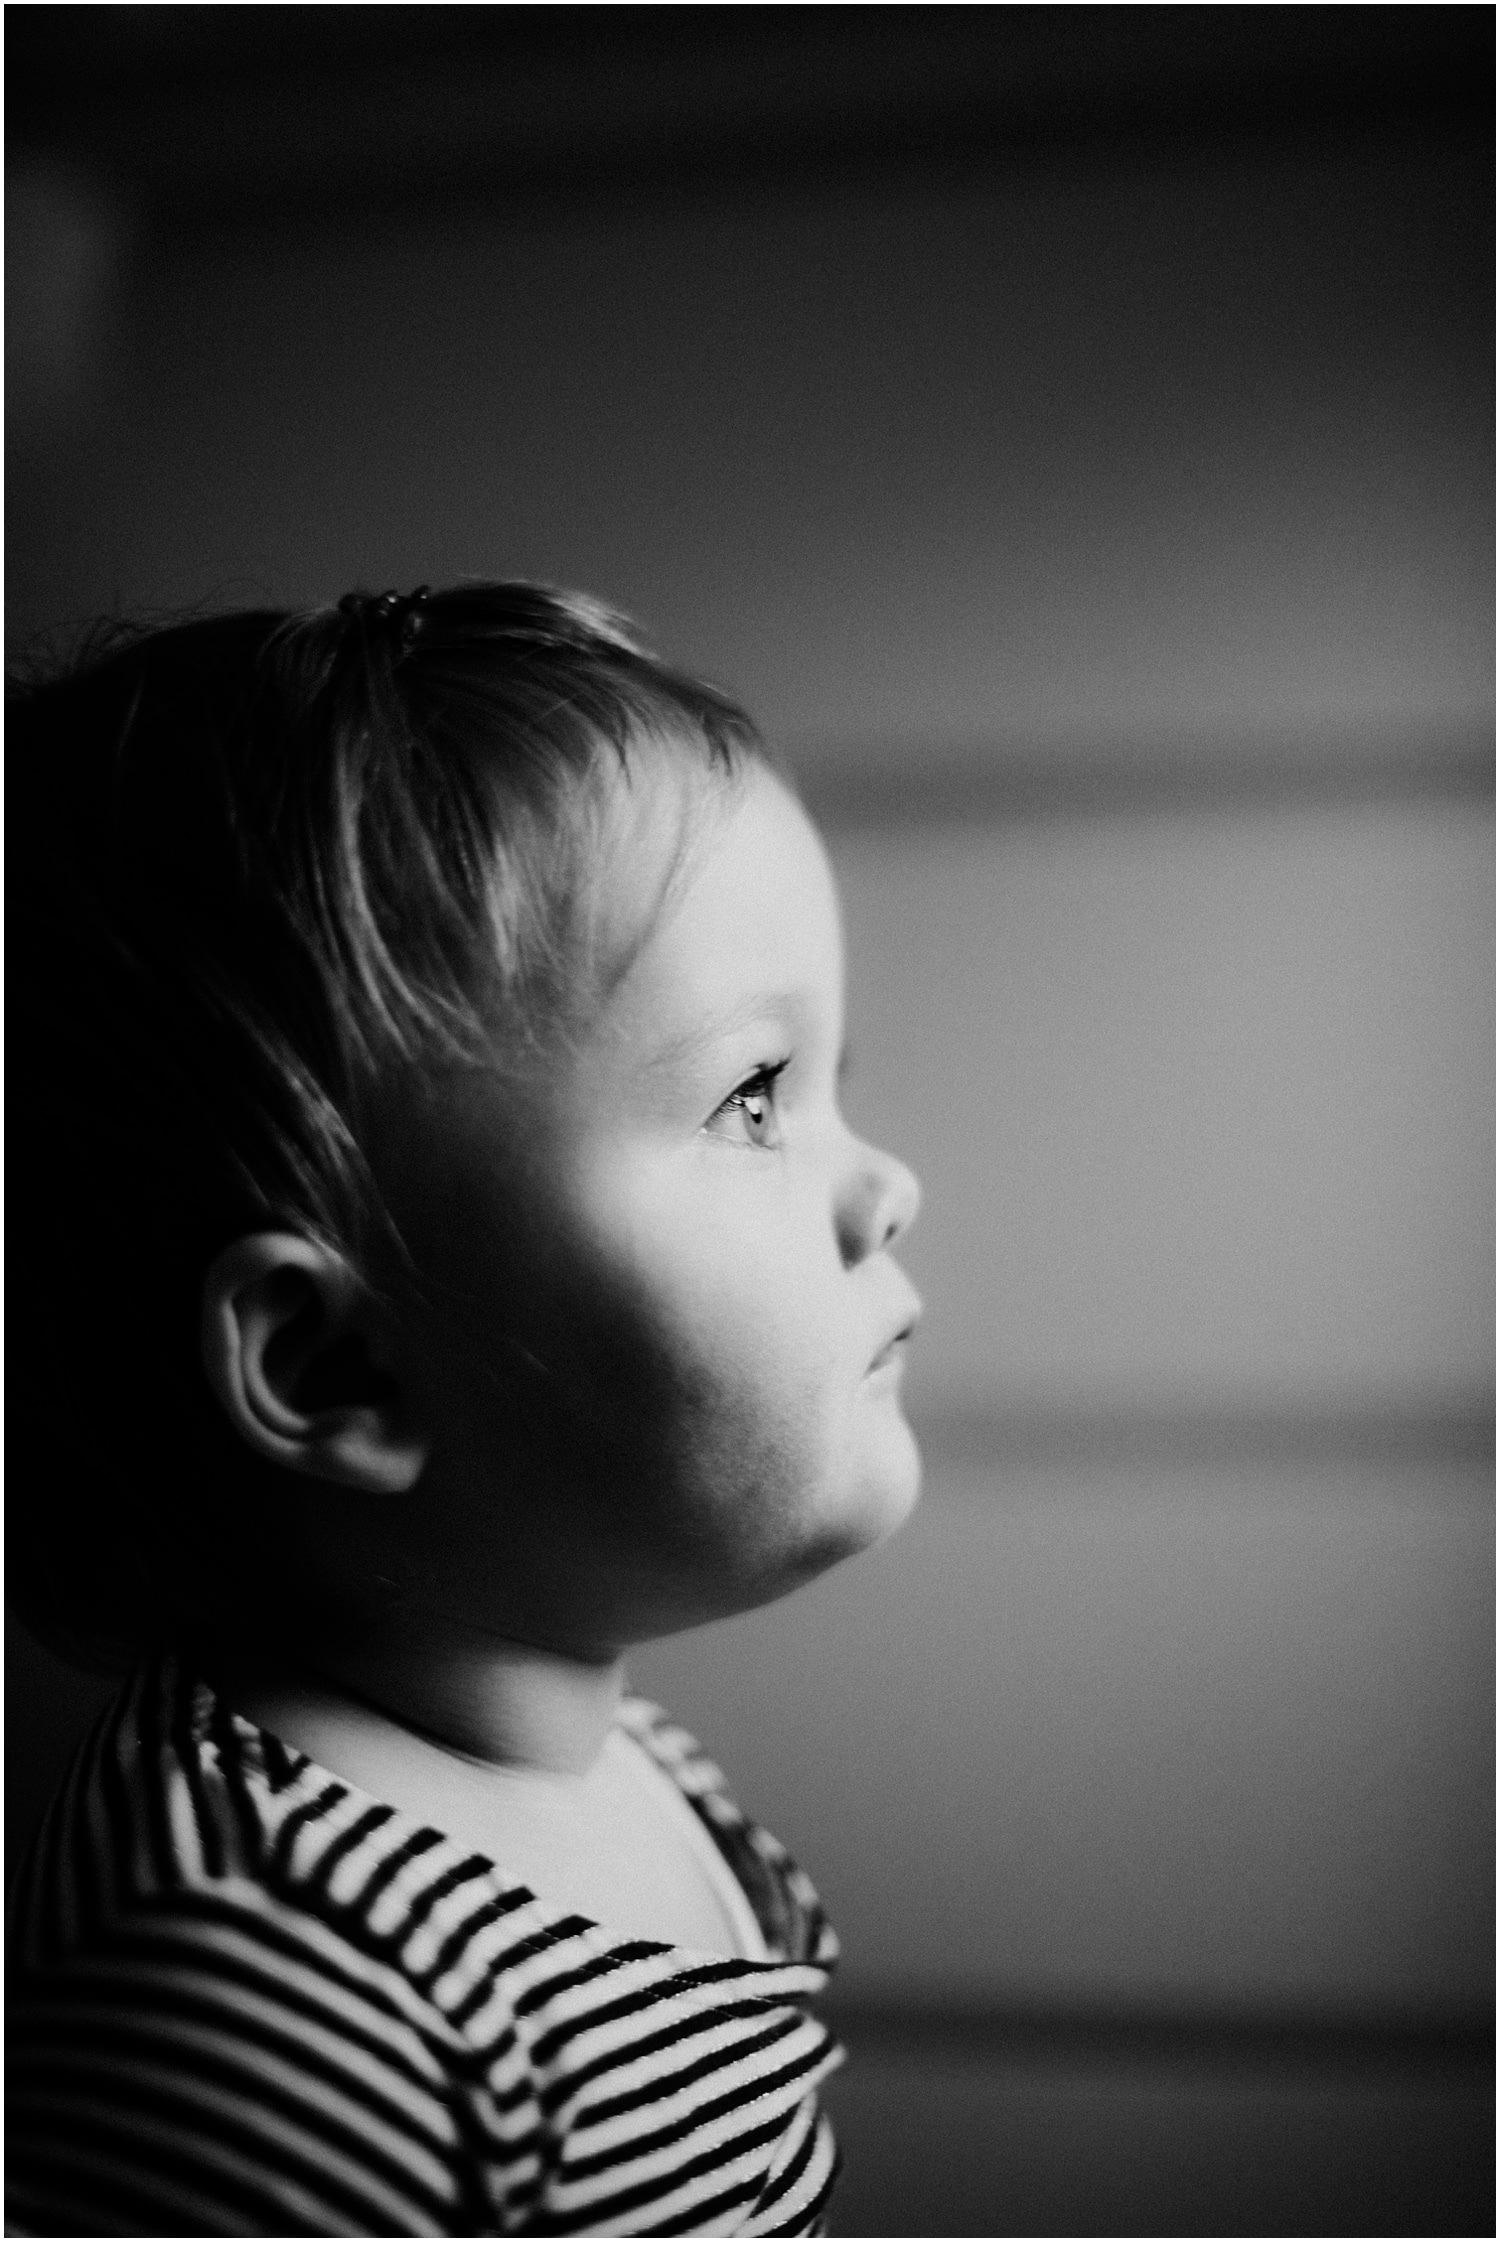 Kleinkind, Portrait Kind, Kinderportrait, Kinderbilder,  Kinderfotograf, Kinderfotografie